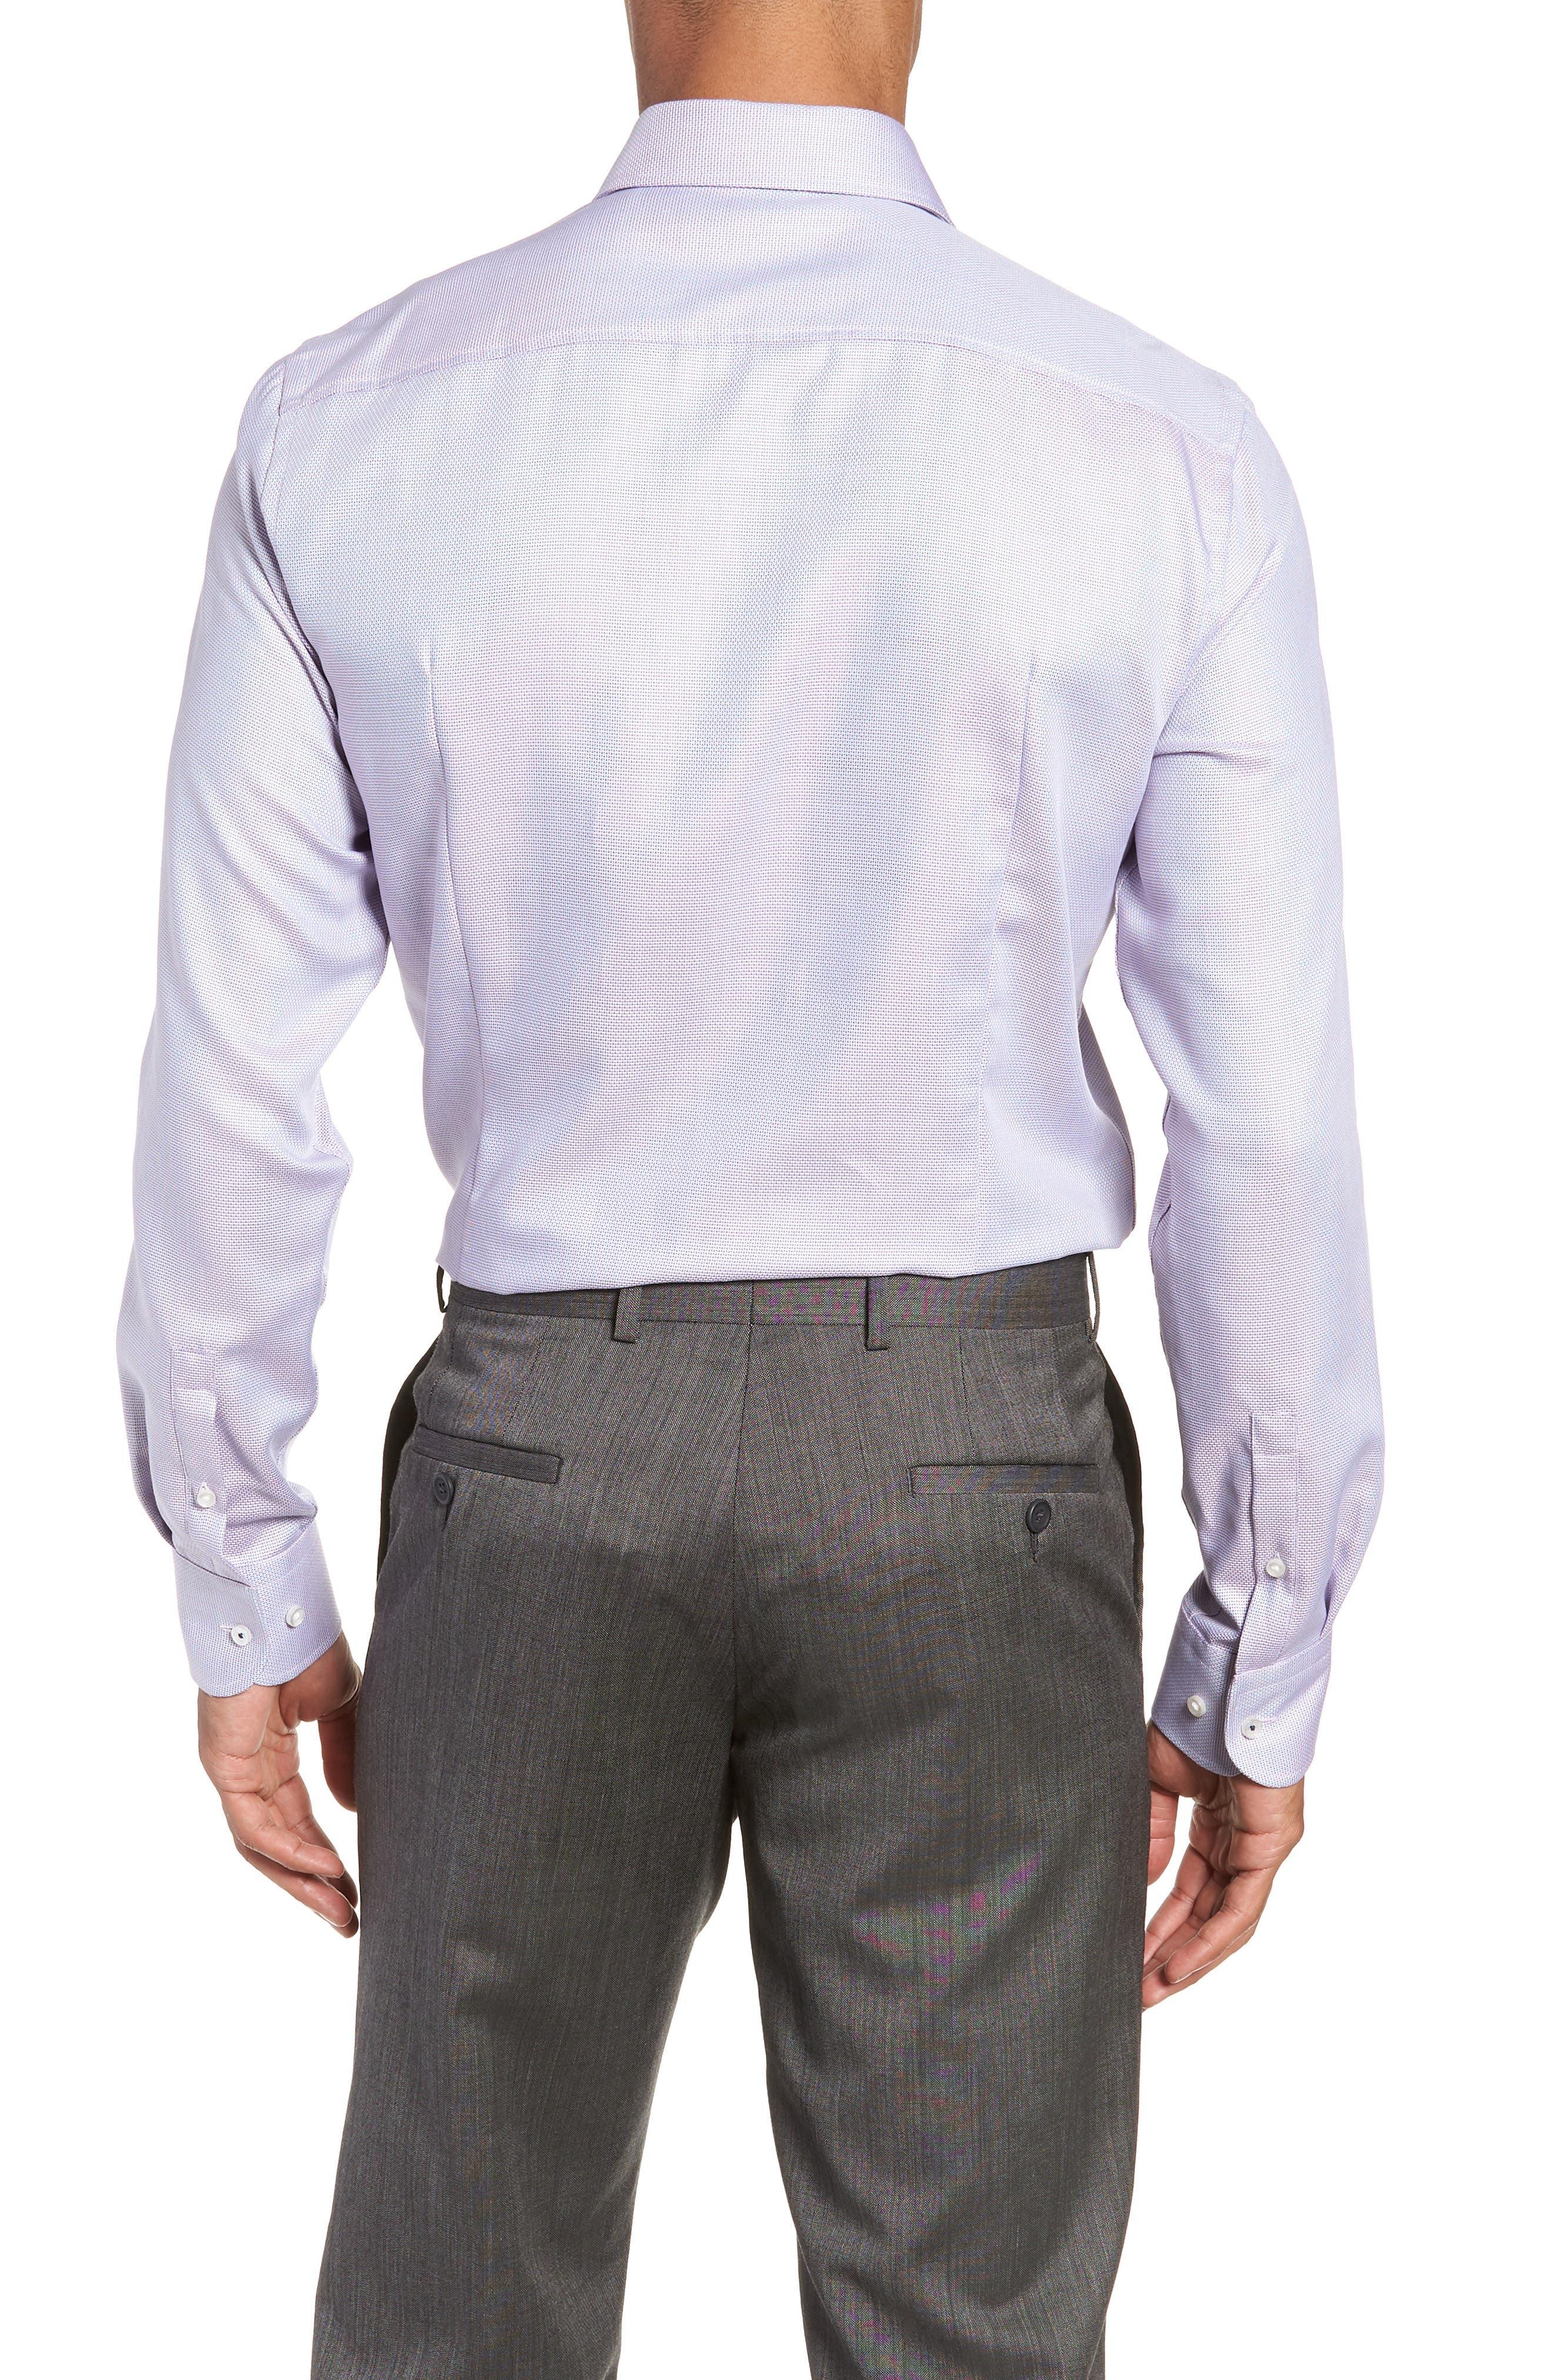 BOSS,                             x Nordstrom Jerrin Slim Fit Solid Dress Shirt,                             Alternate thumbnail 3, color,                             LAVENDER